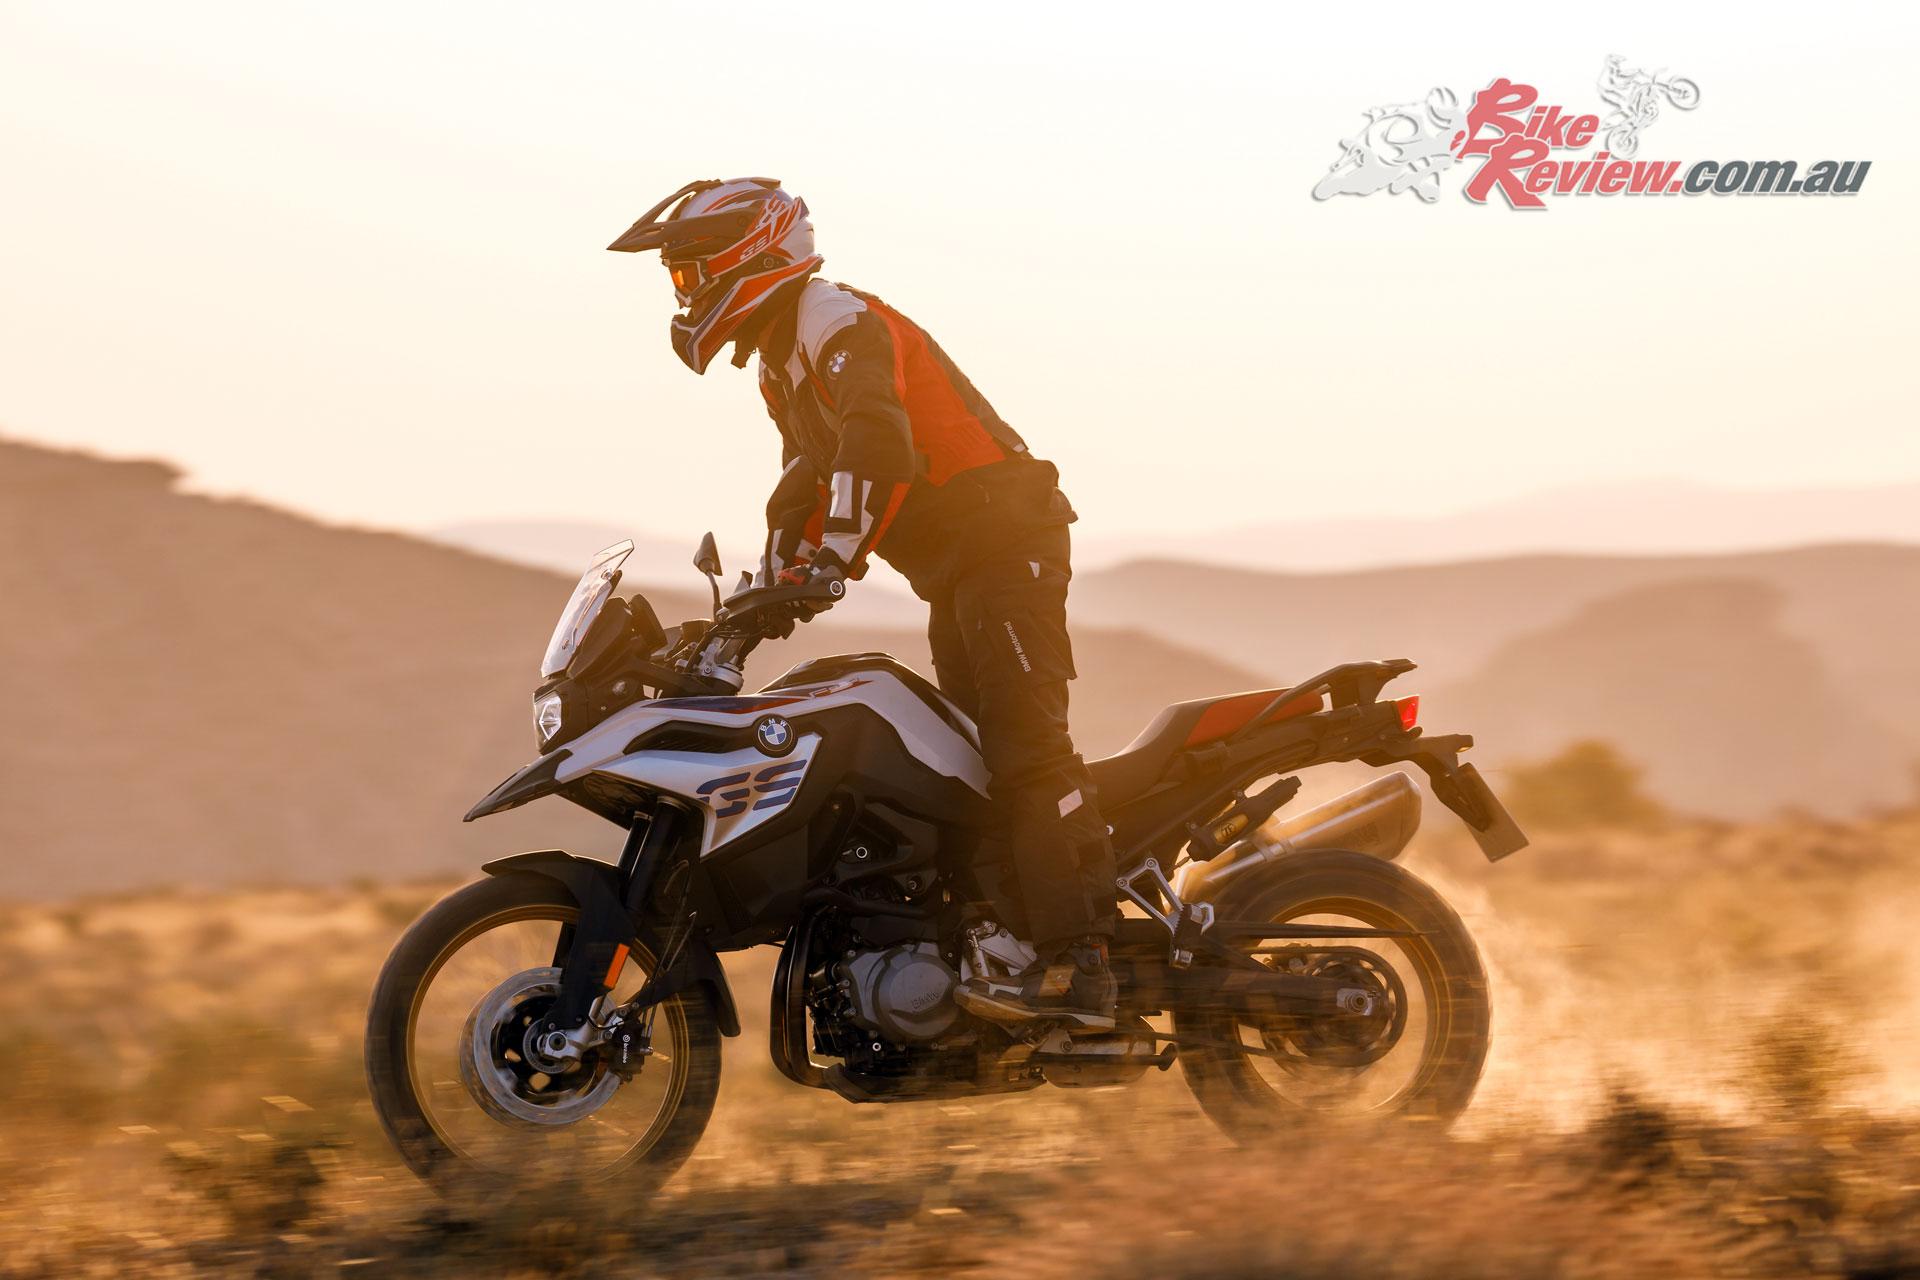 BMW Motorrad Australia celebrate 25 years of the BMW Safari in 2019